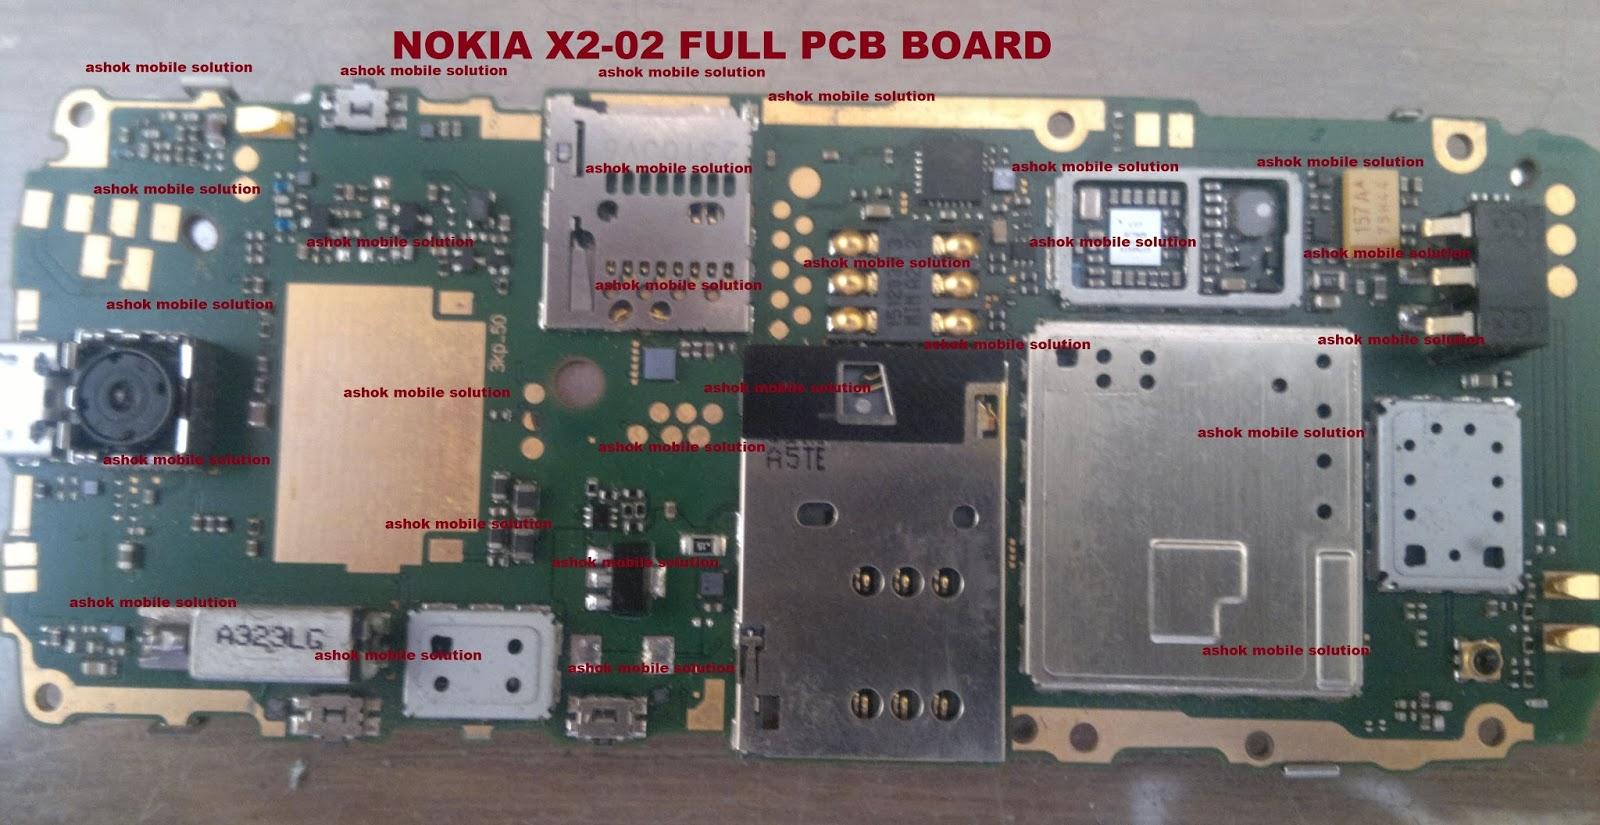 ashok mobile solution nokia x2 02 full pcb board rh samraatblogpostcom blogspot com